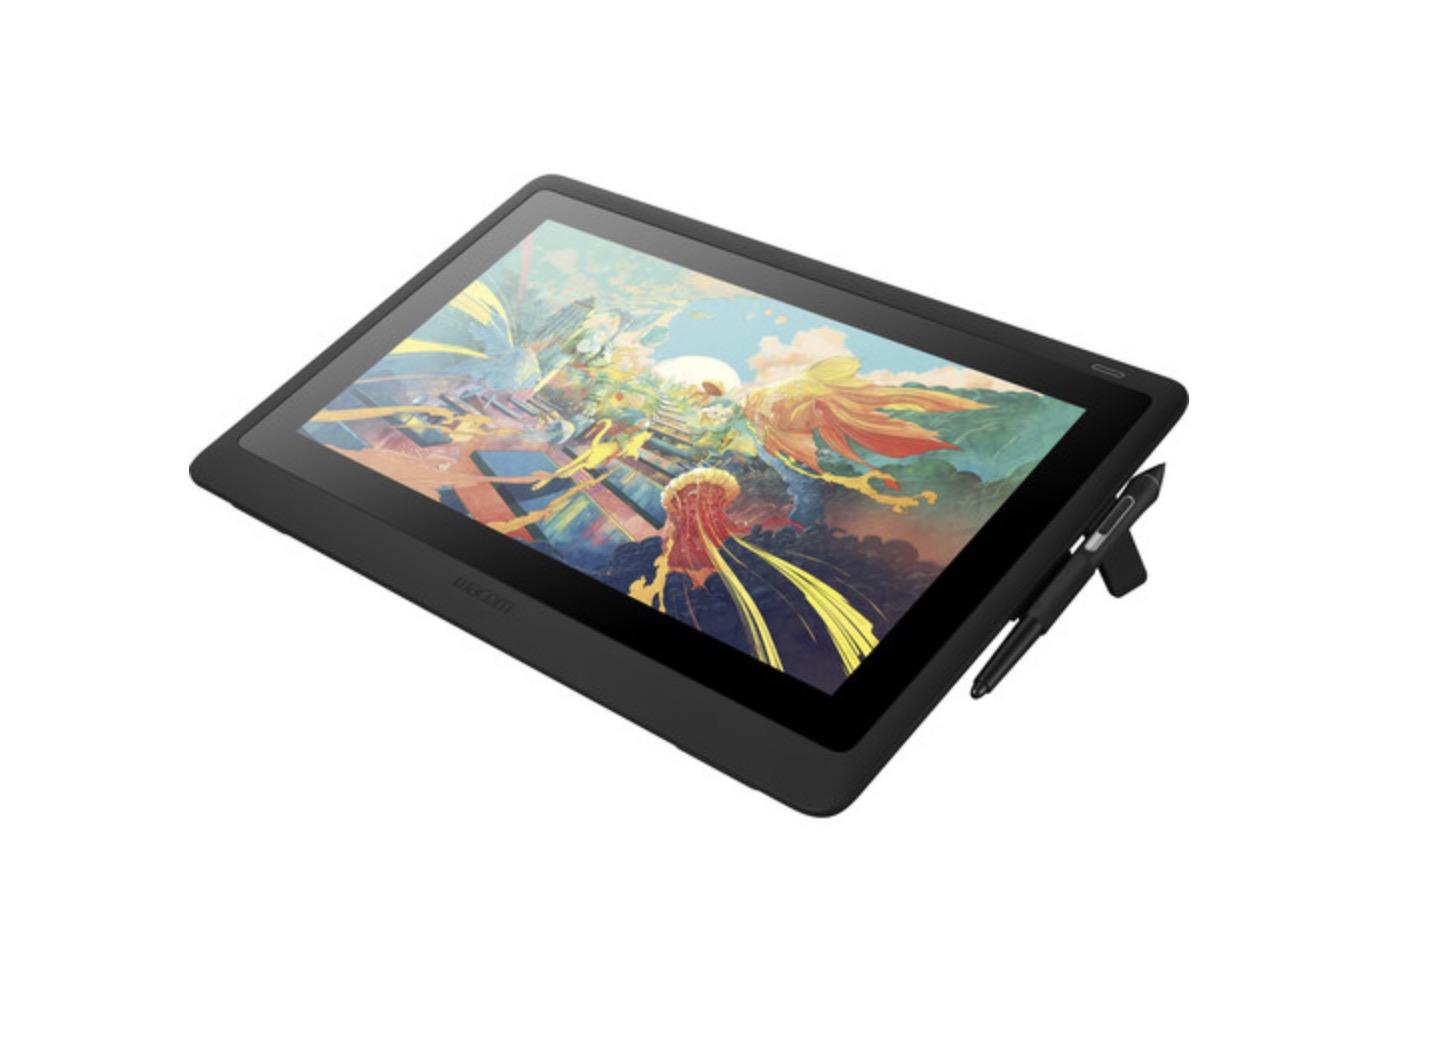 Wacom announces the Cintiq 16HD, a Full HD graphics tablet